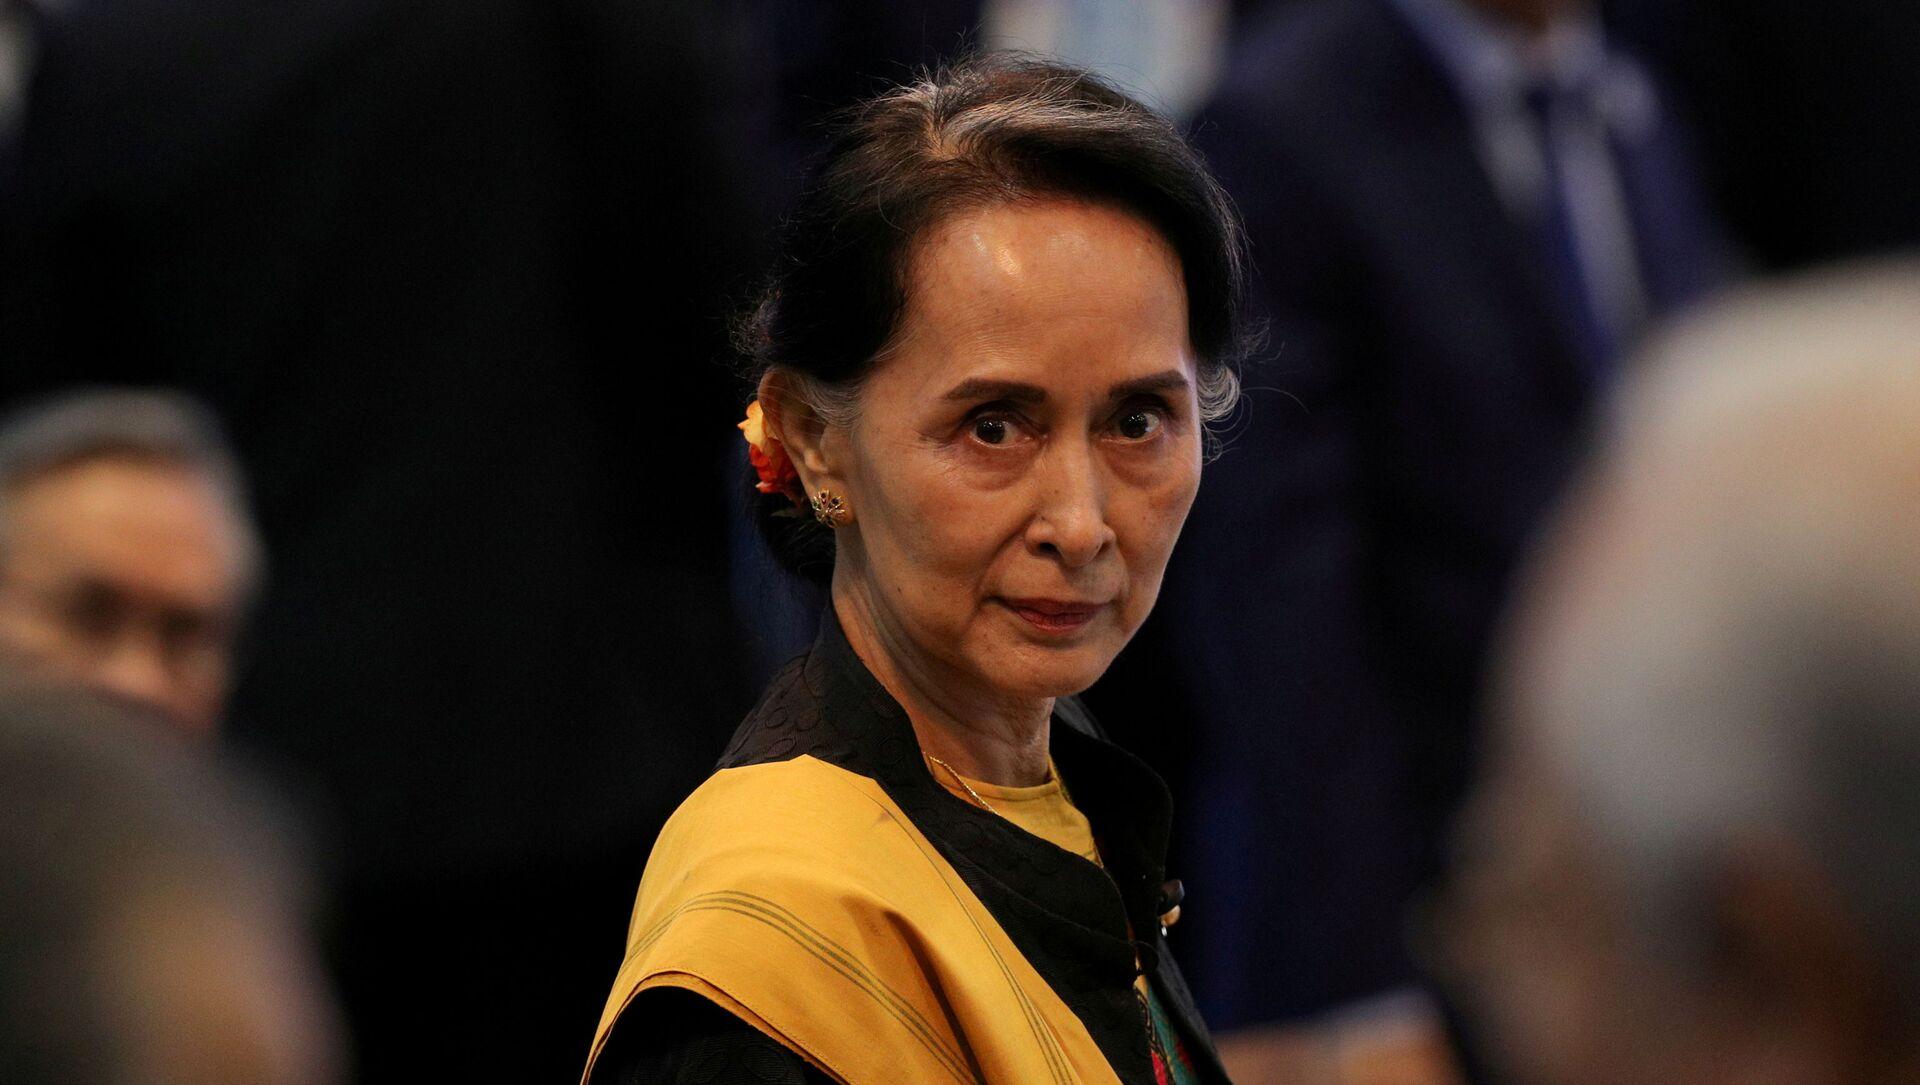 Myanmar, presentati i capi d'accusa contro il presidente Win Myint e Aung San Suu Kyi - Sputnik Italia, 1920, 03.02.2021